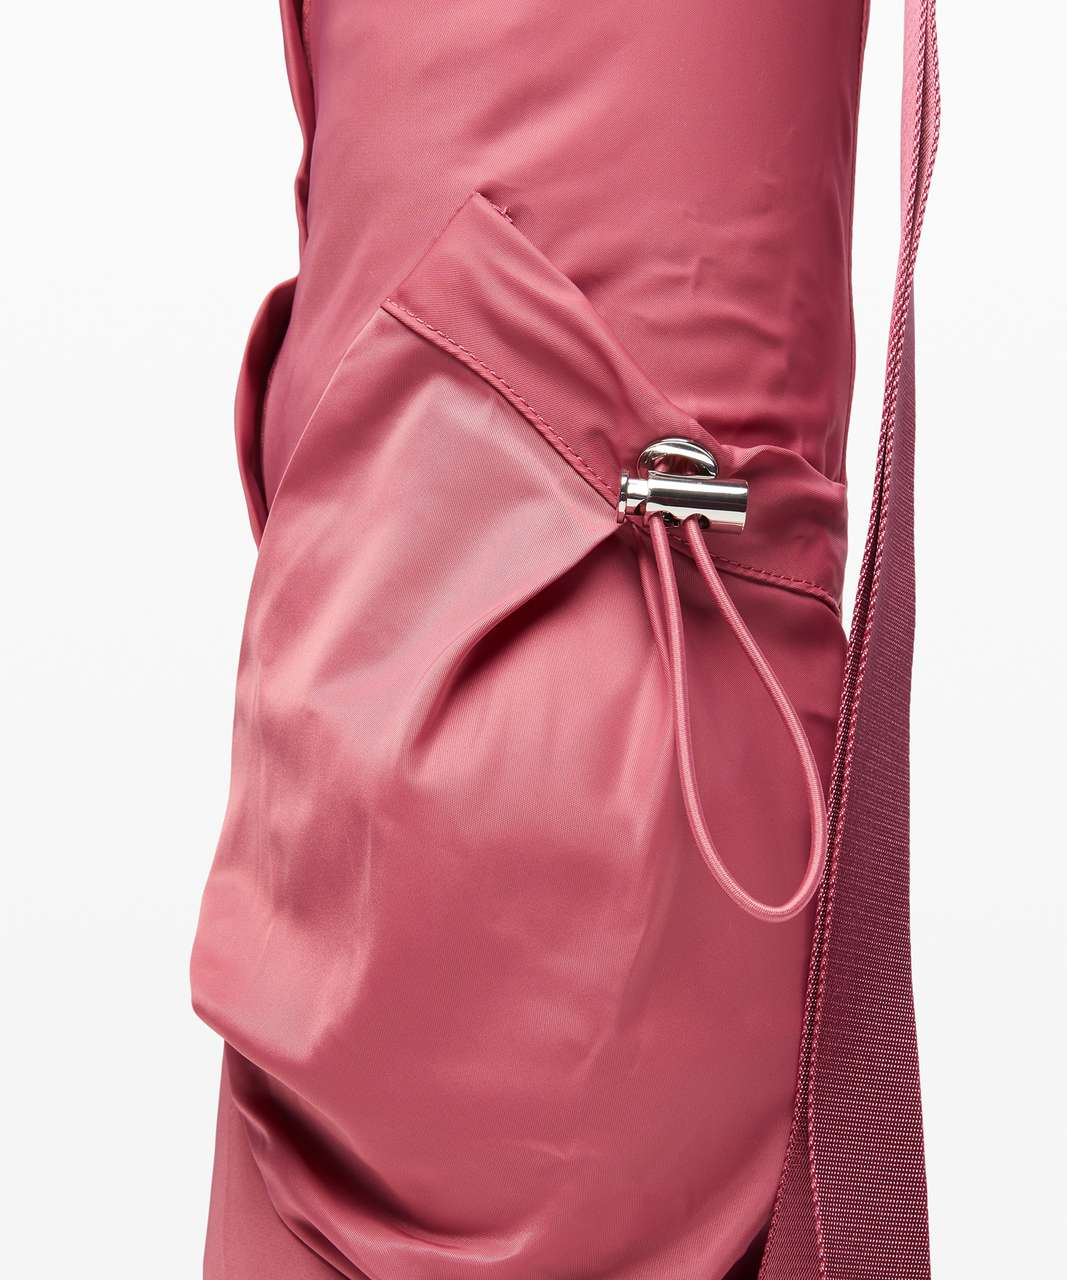 Lululemon The Yoga Mat Bag *16L - Cherry Tint